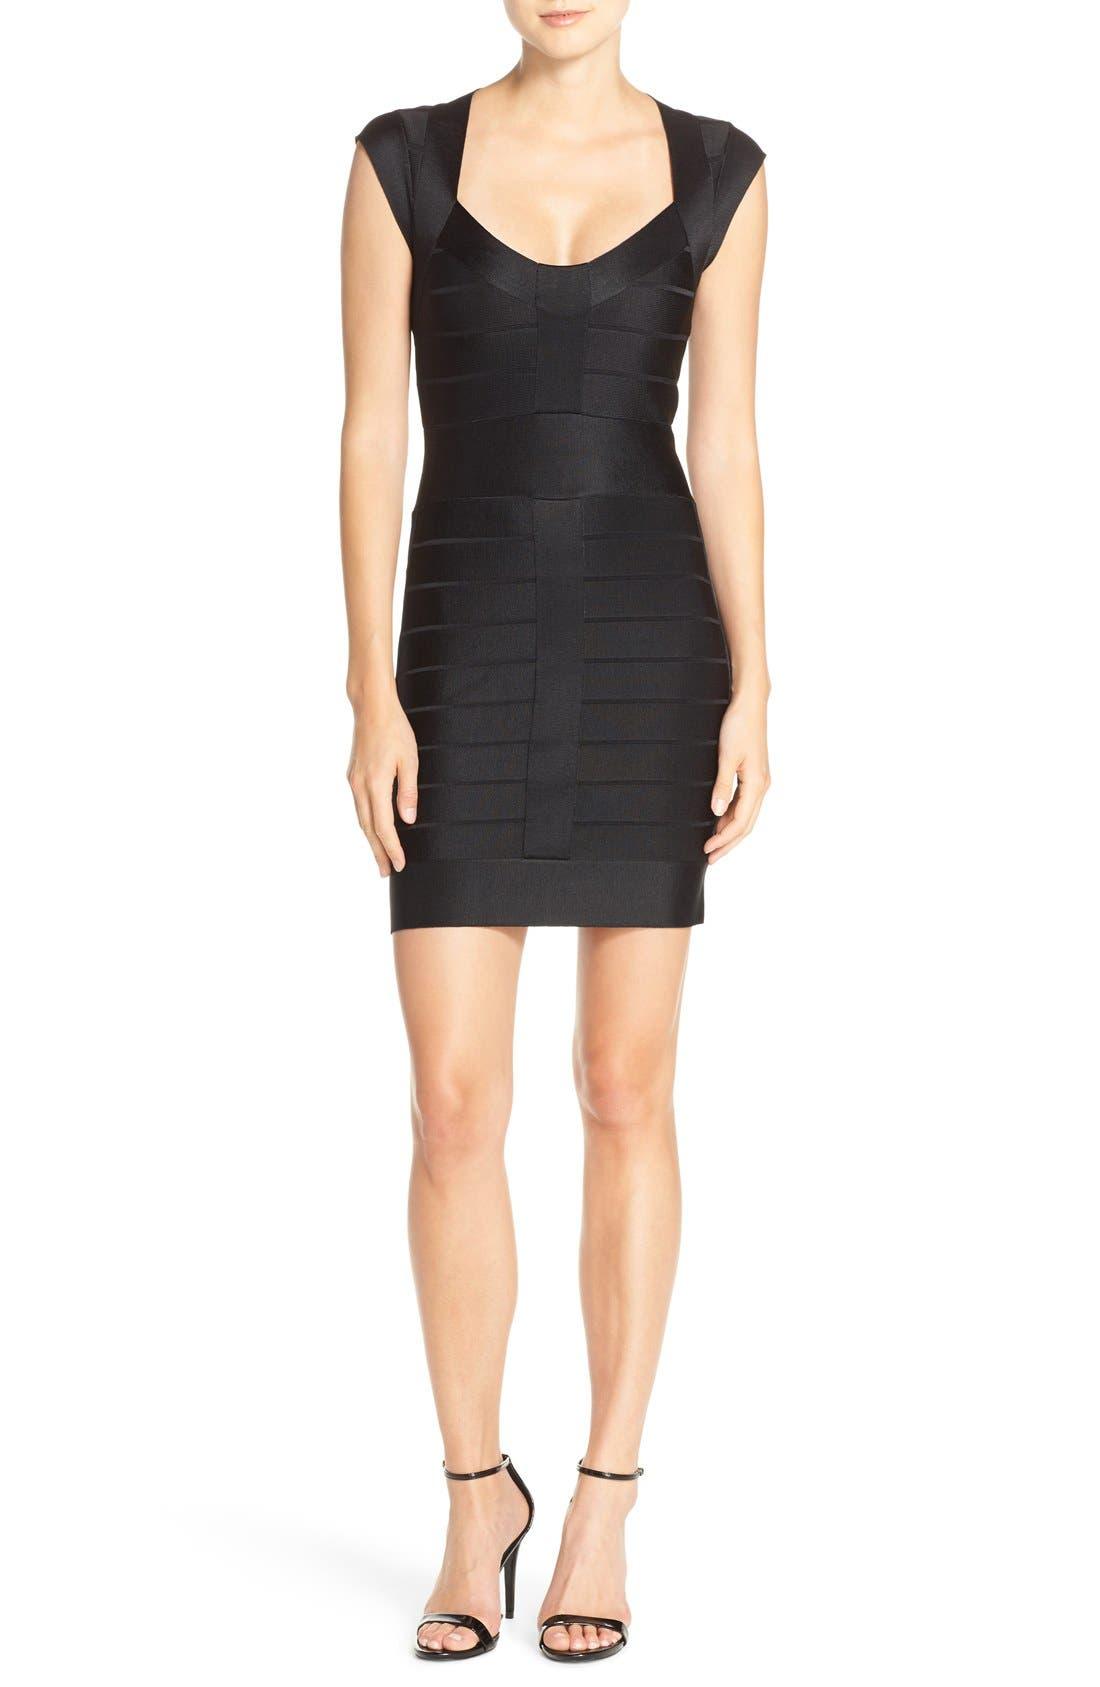 Alternate Image 1 Selected - French Connection 'Miami Spotlight' Cap Sleeve Bandage Dress